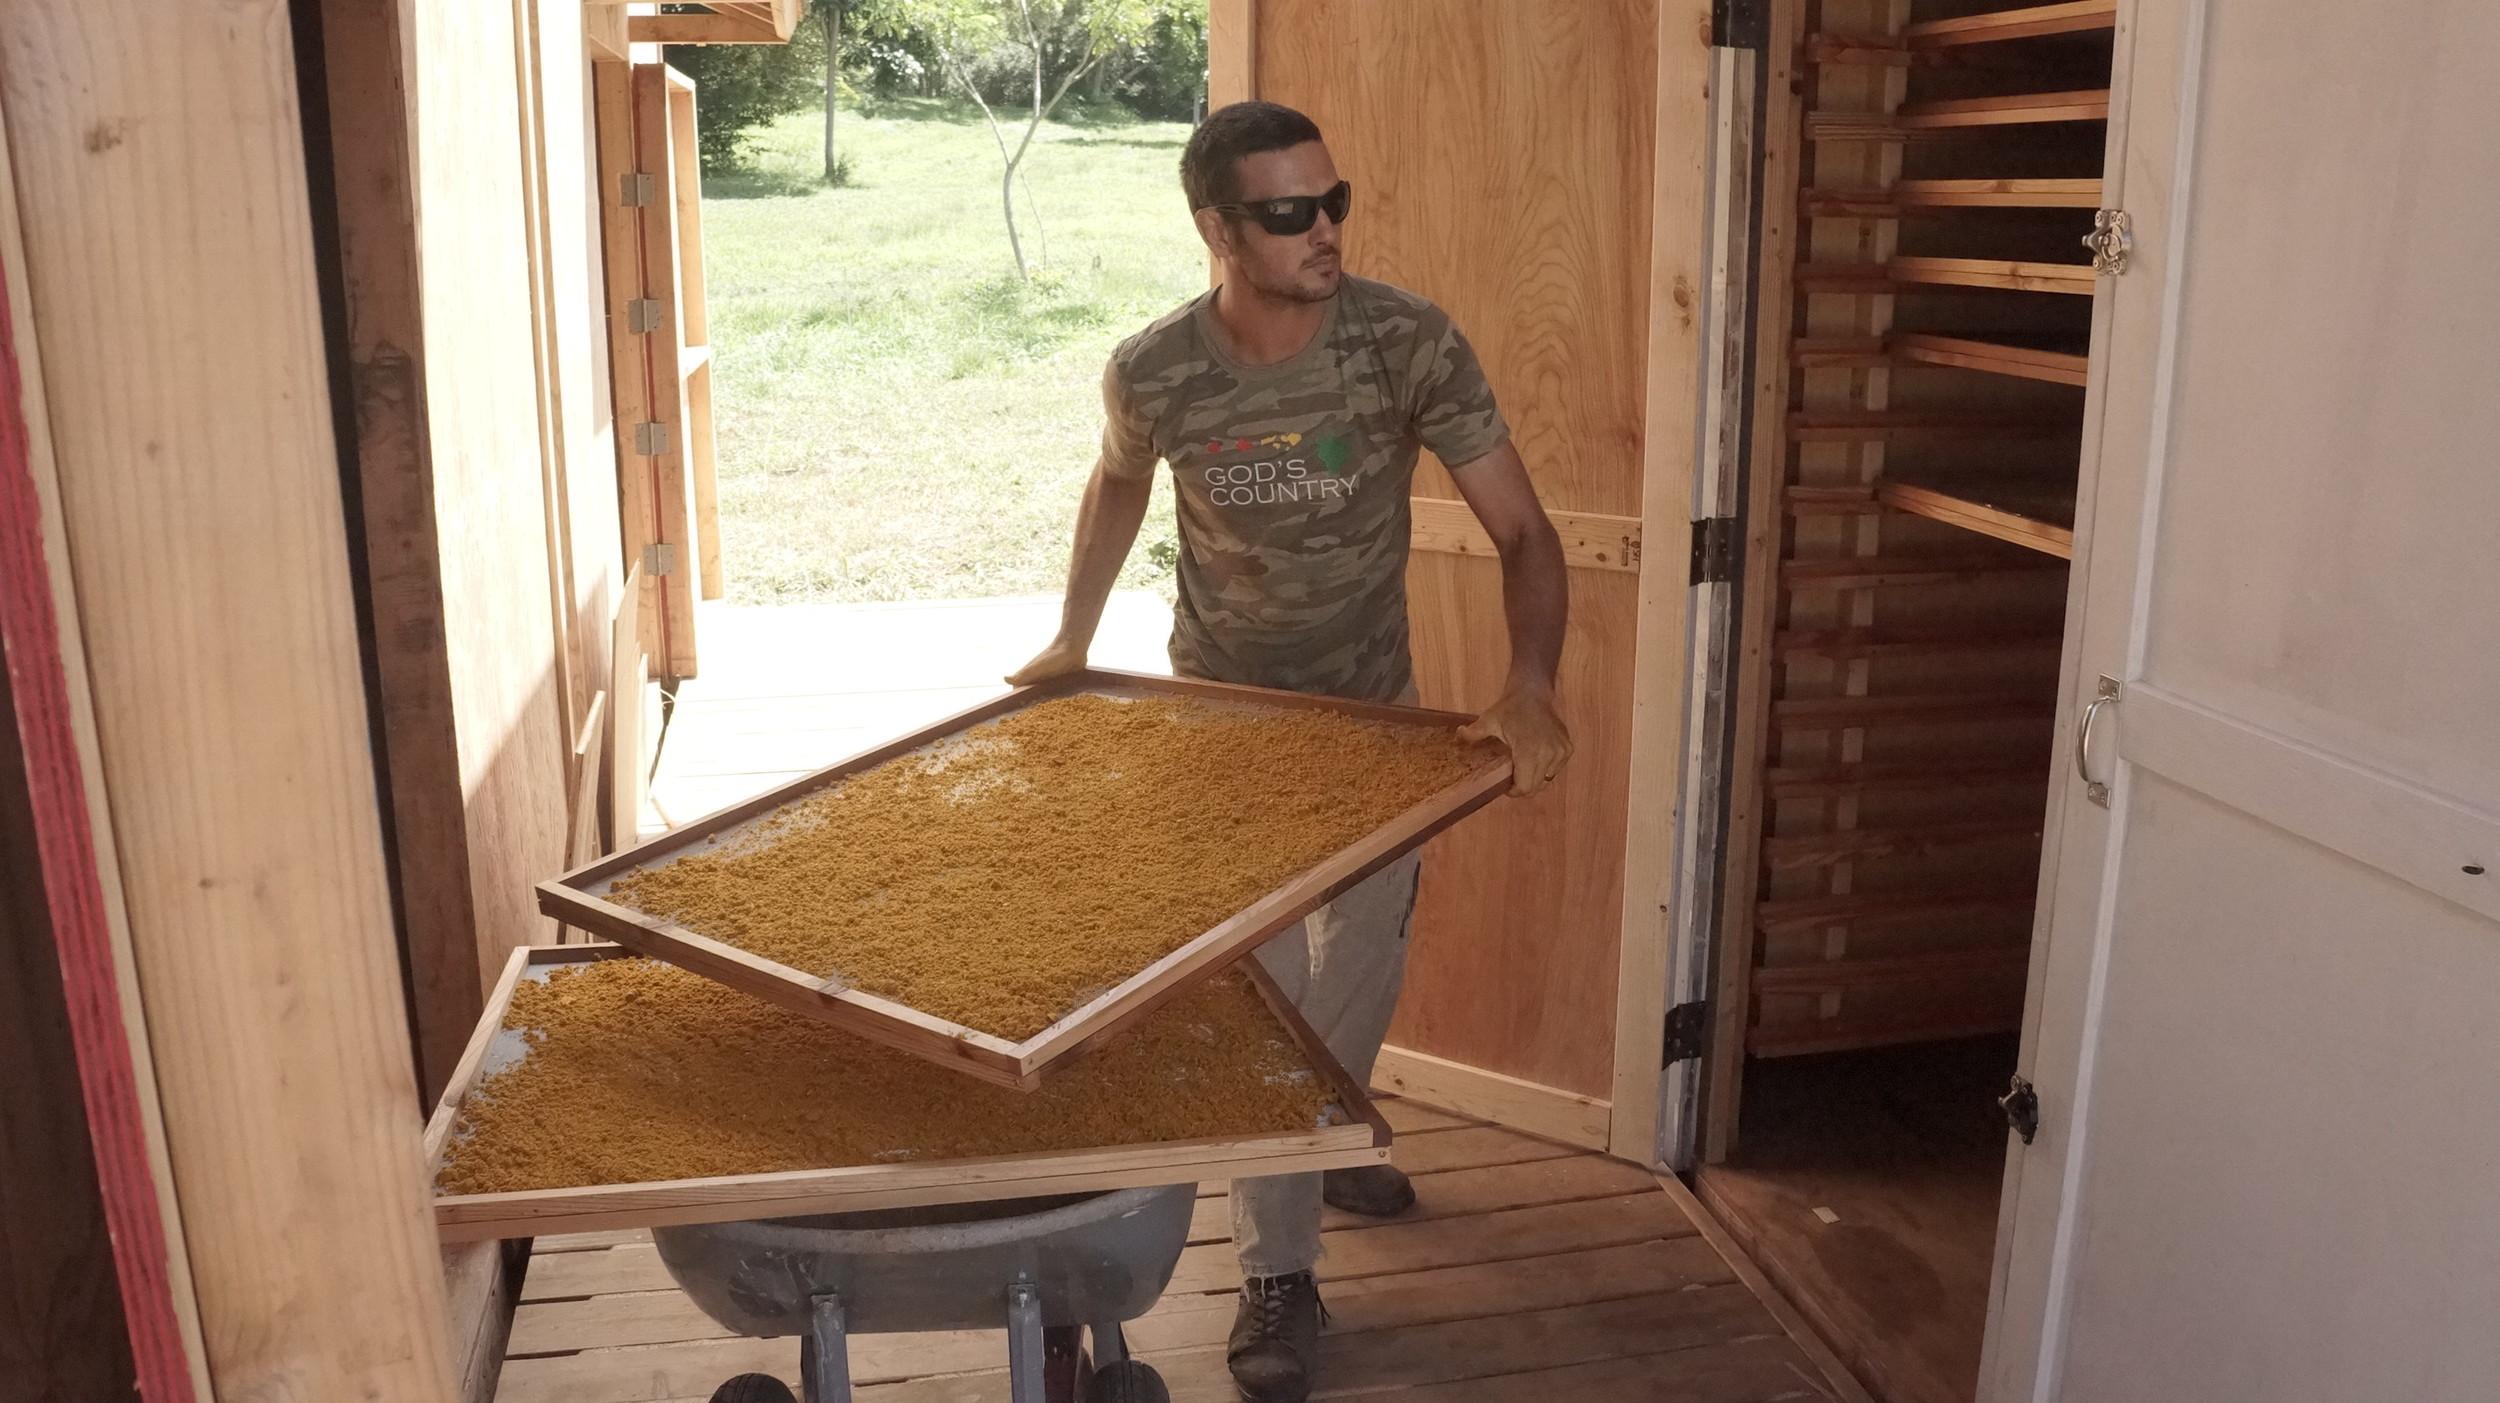 Aaron loading the solar dehydrator